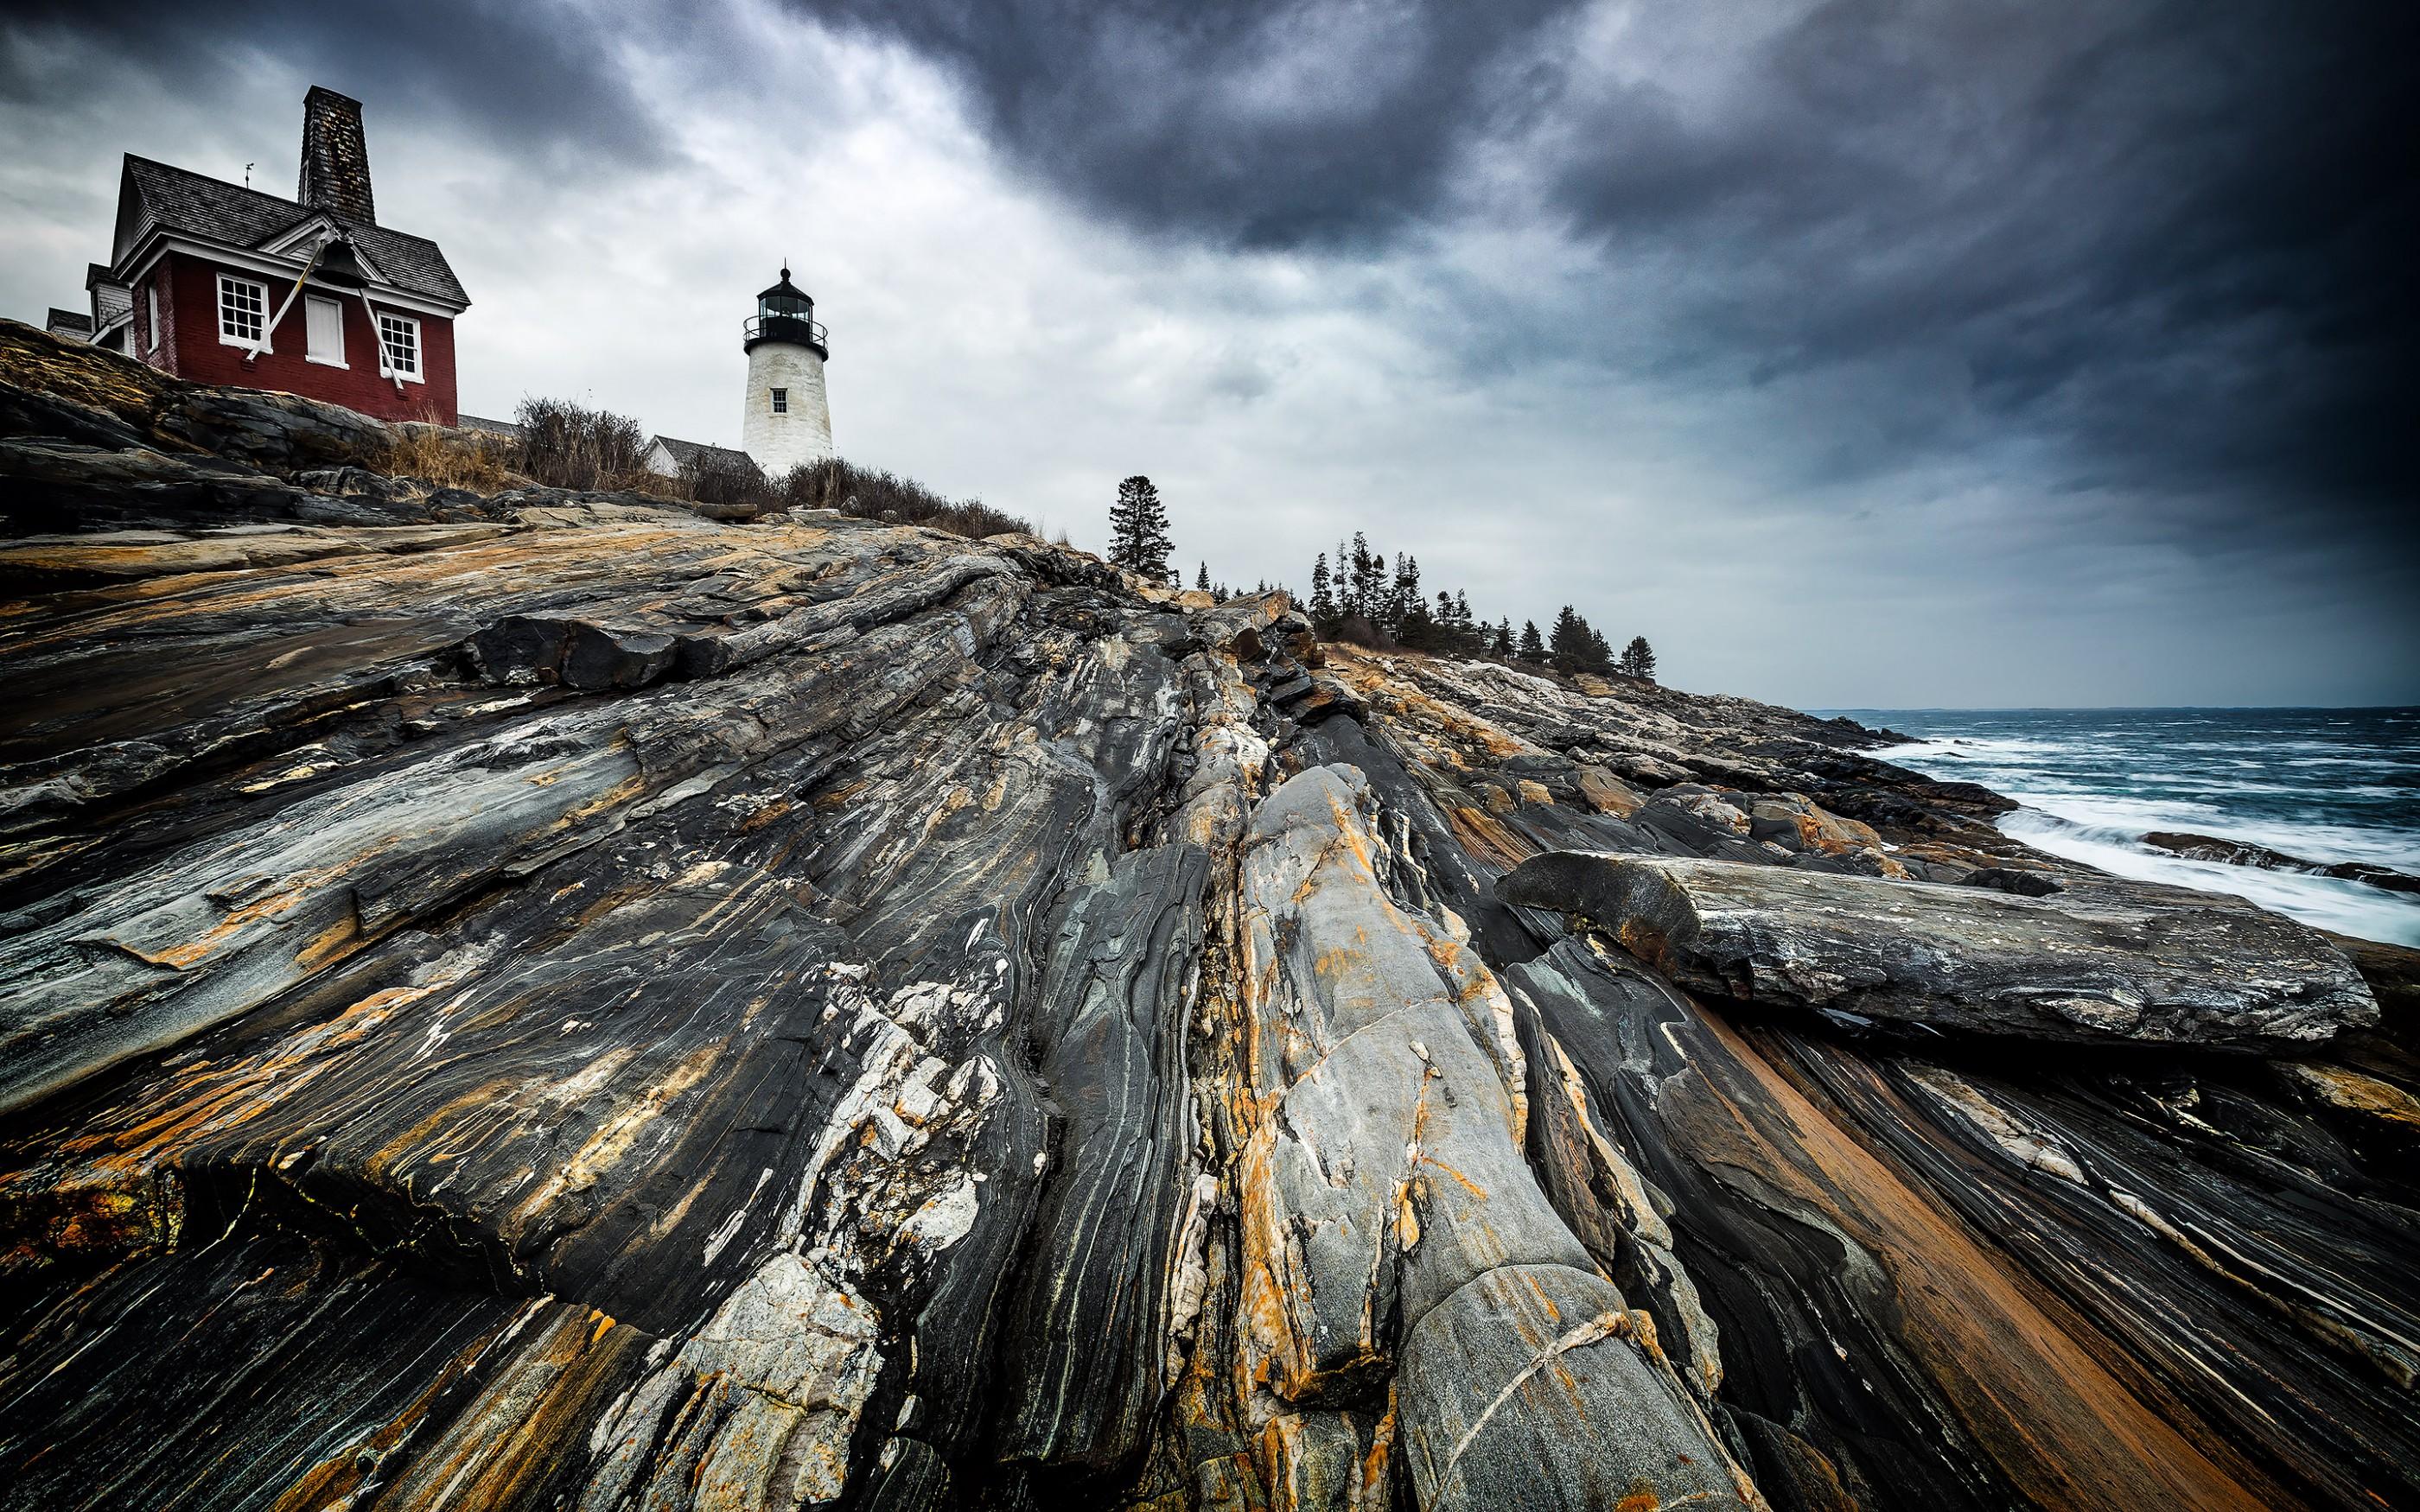 pemaquid-point-lighthouse-maine-ash-newell